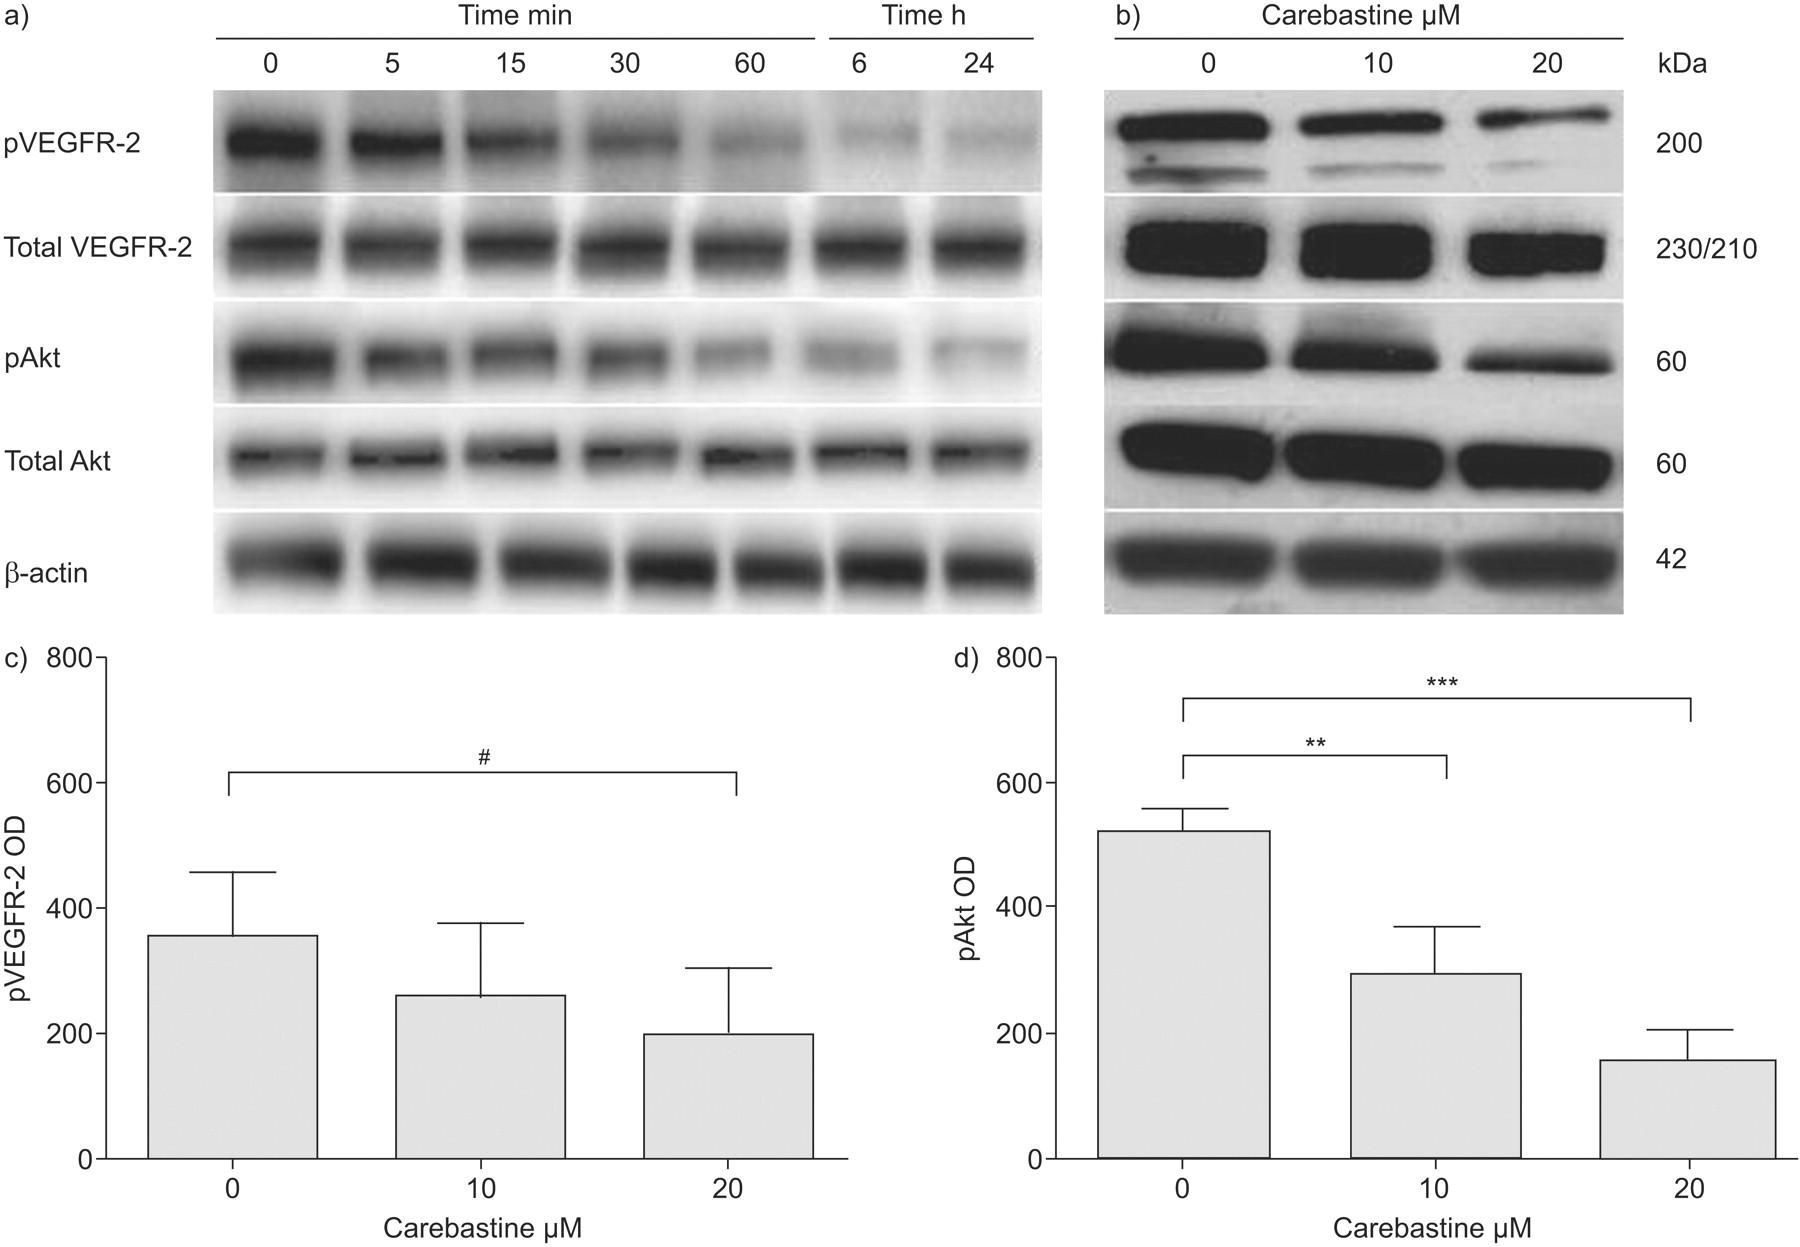 Anti-angiogenic activity of carebastine: a plausible